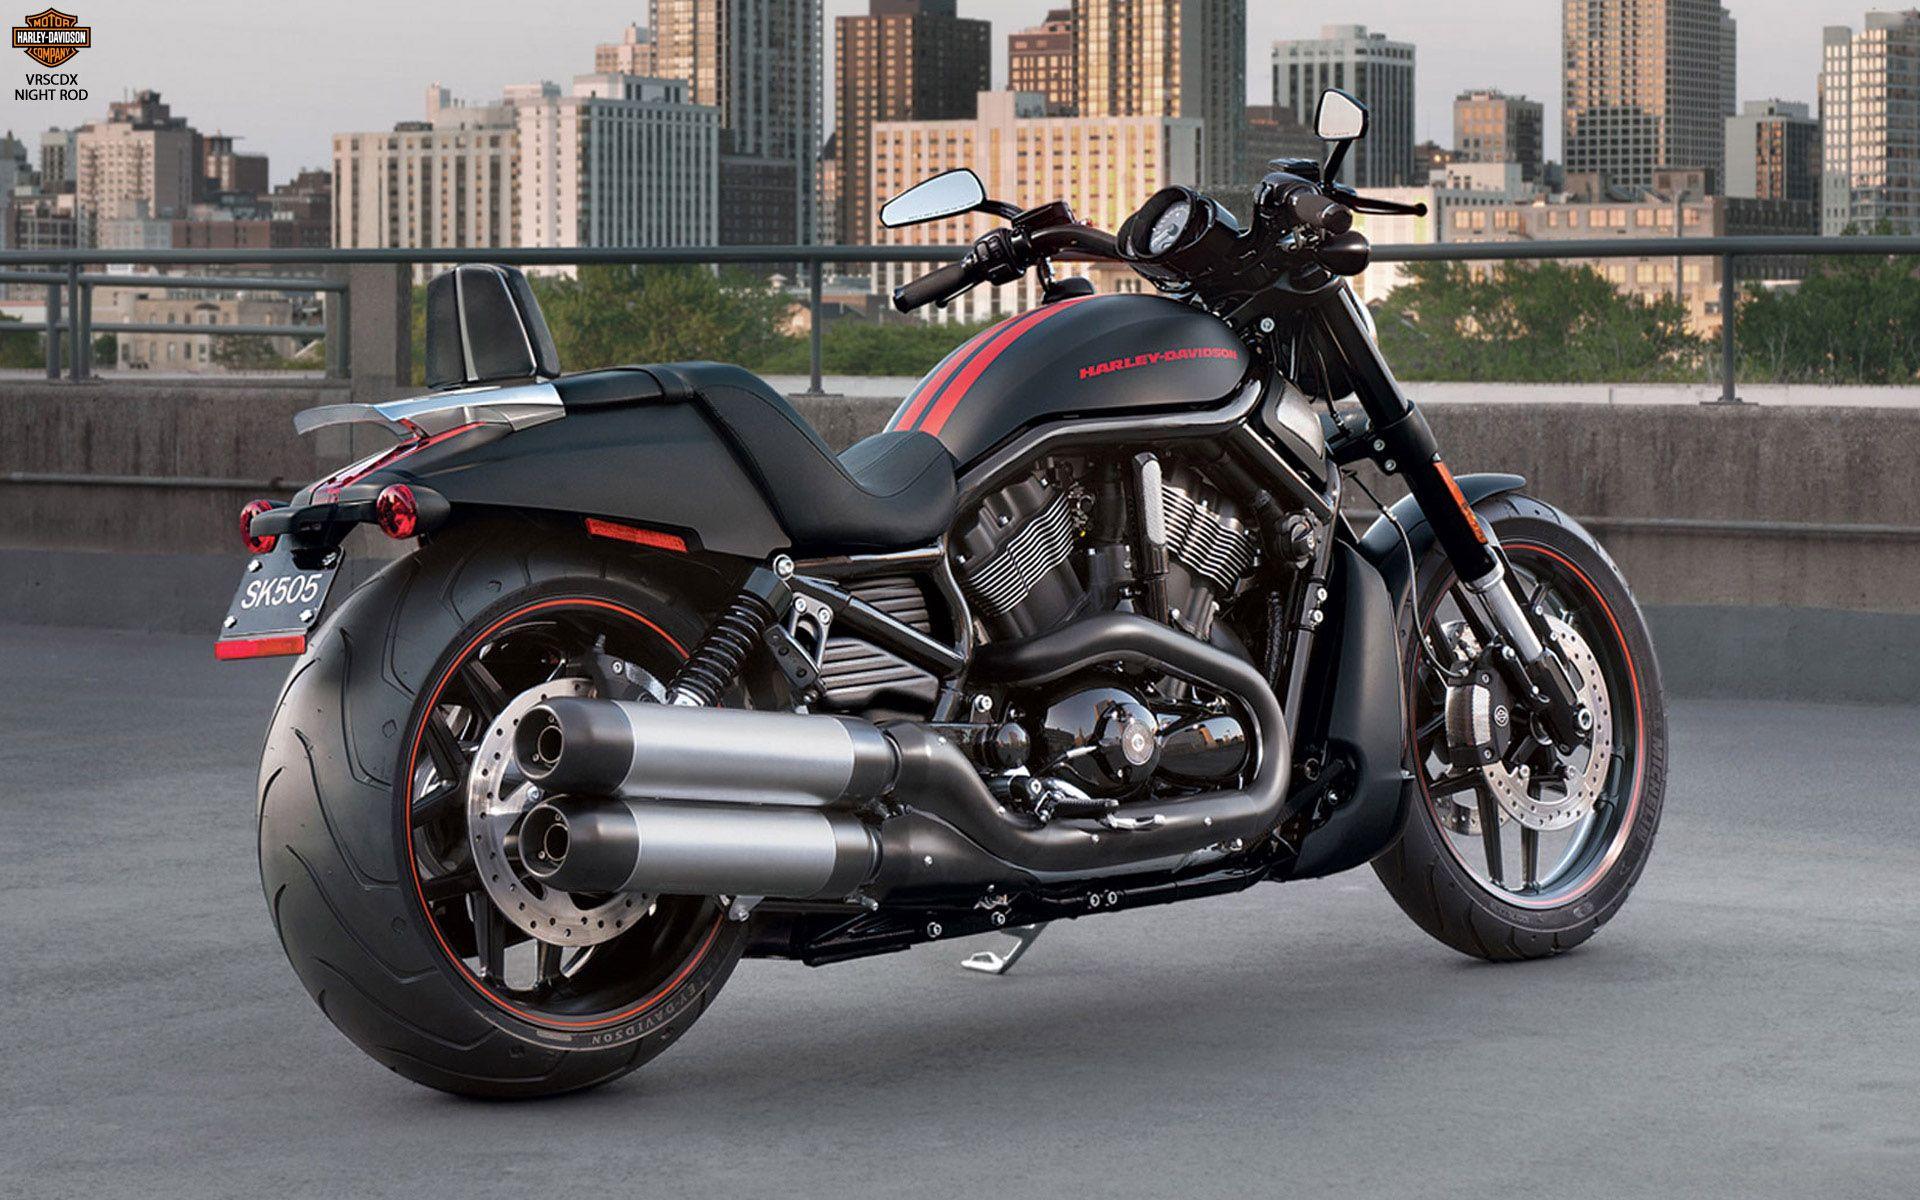 Harley Davidson Vrscdx Night Rod Pc Wallpaper Harley